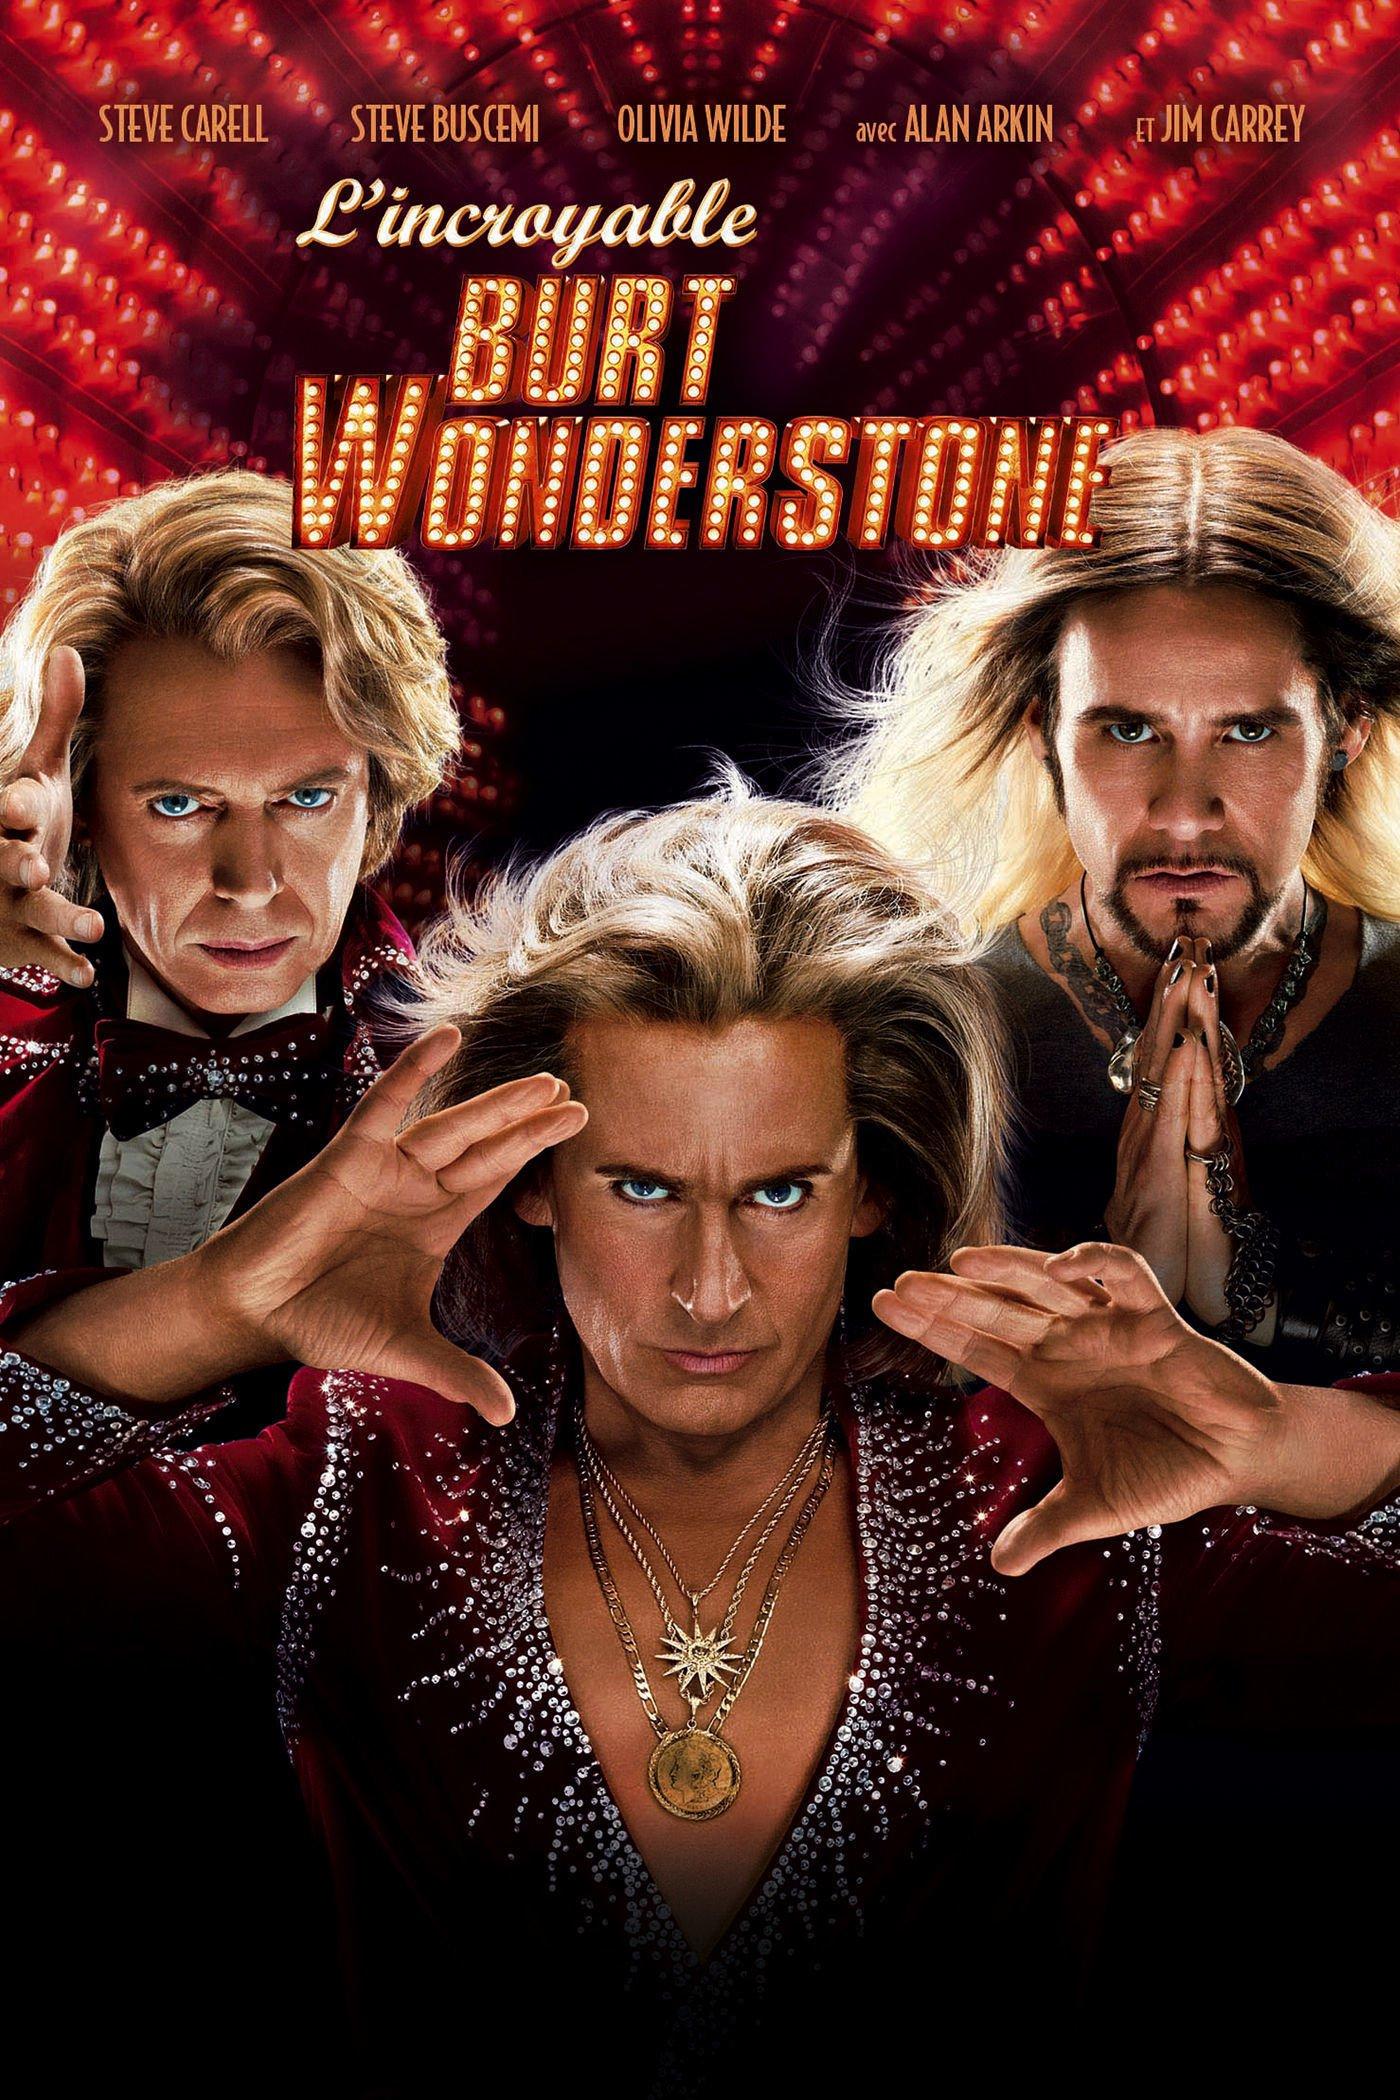 affiche du film L'incroyable Burt Wonderstone